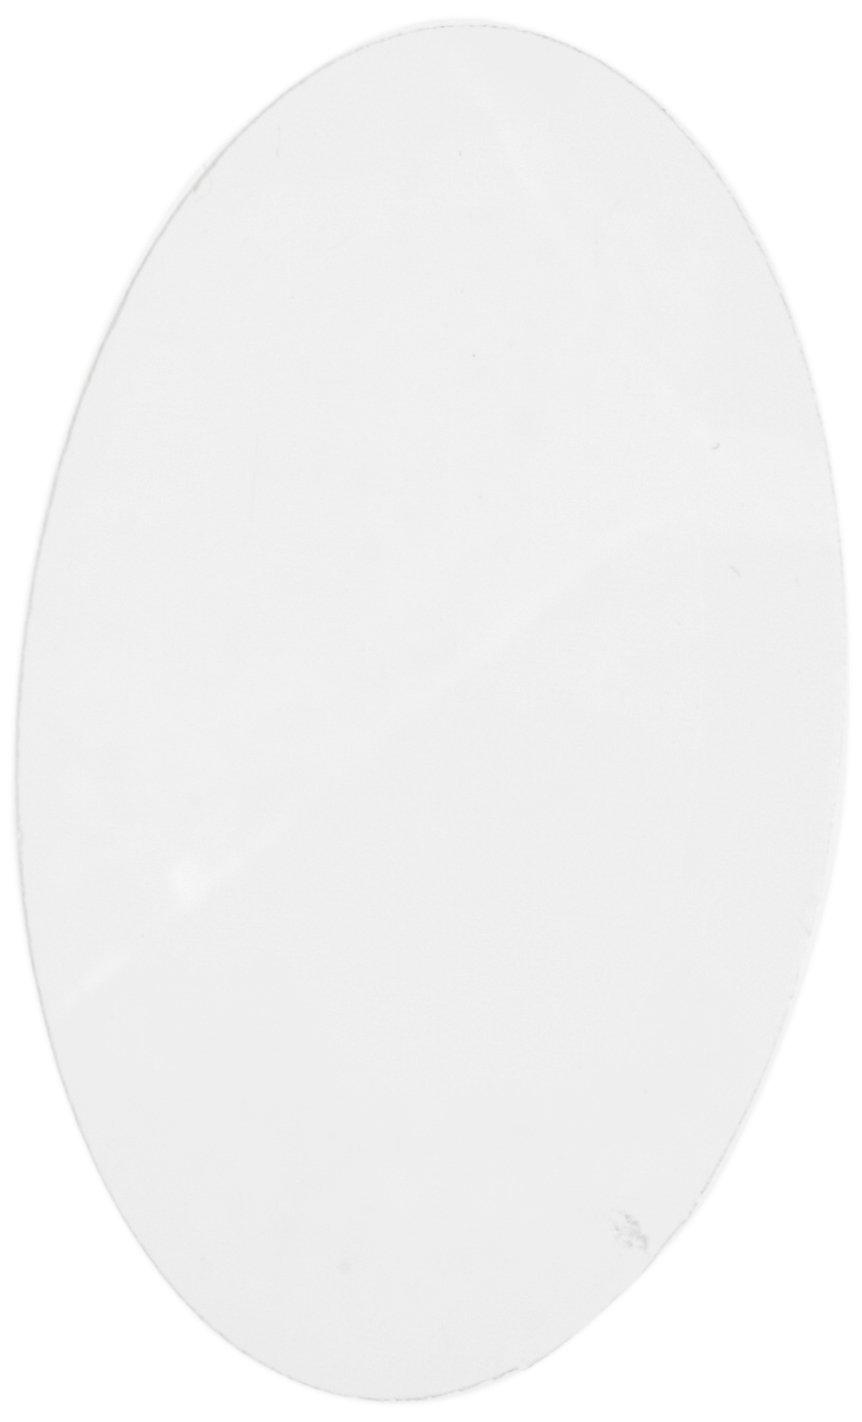 Harvard Apparatus CS-8R Round Cover Glass, No. 1 Thickness, 8mm Diameter (Pack of 100) by Harvard Apparatus